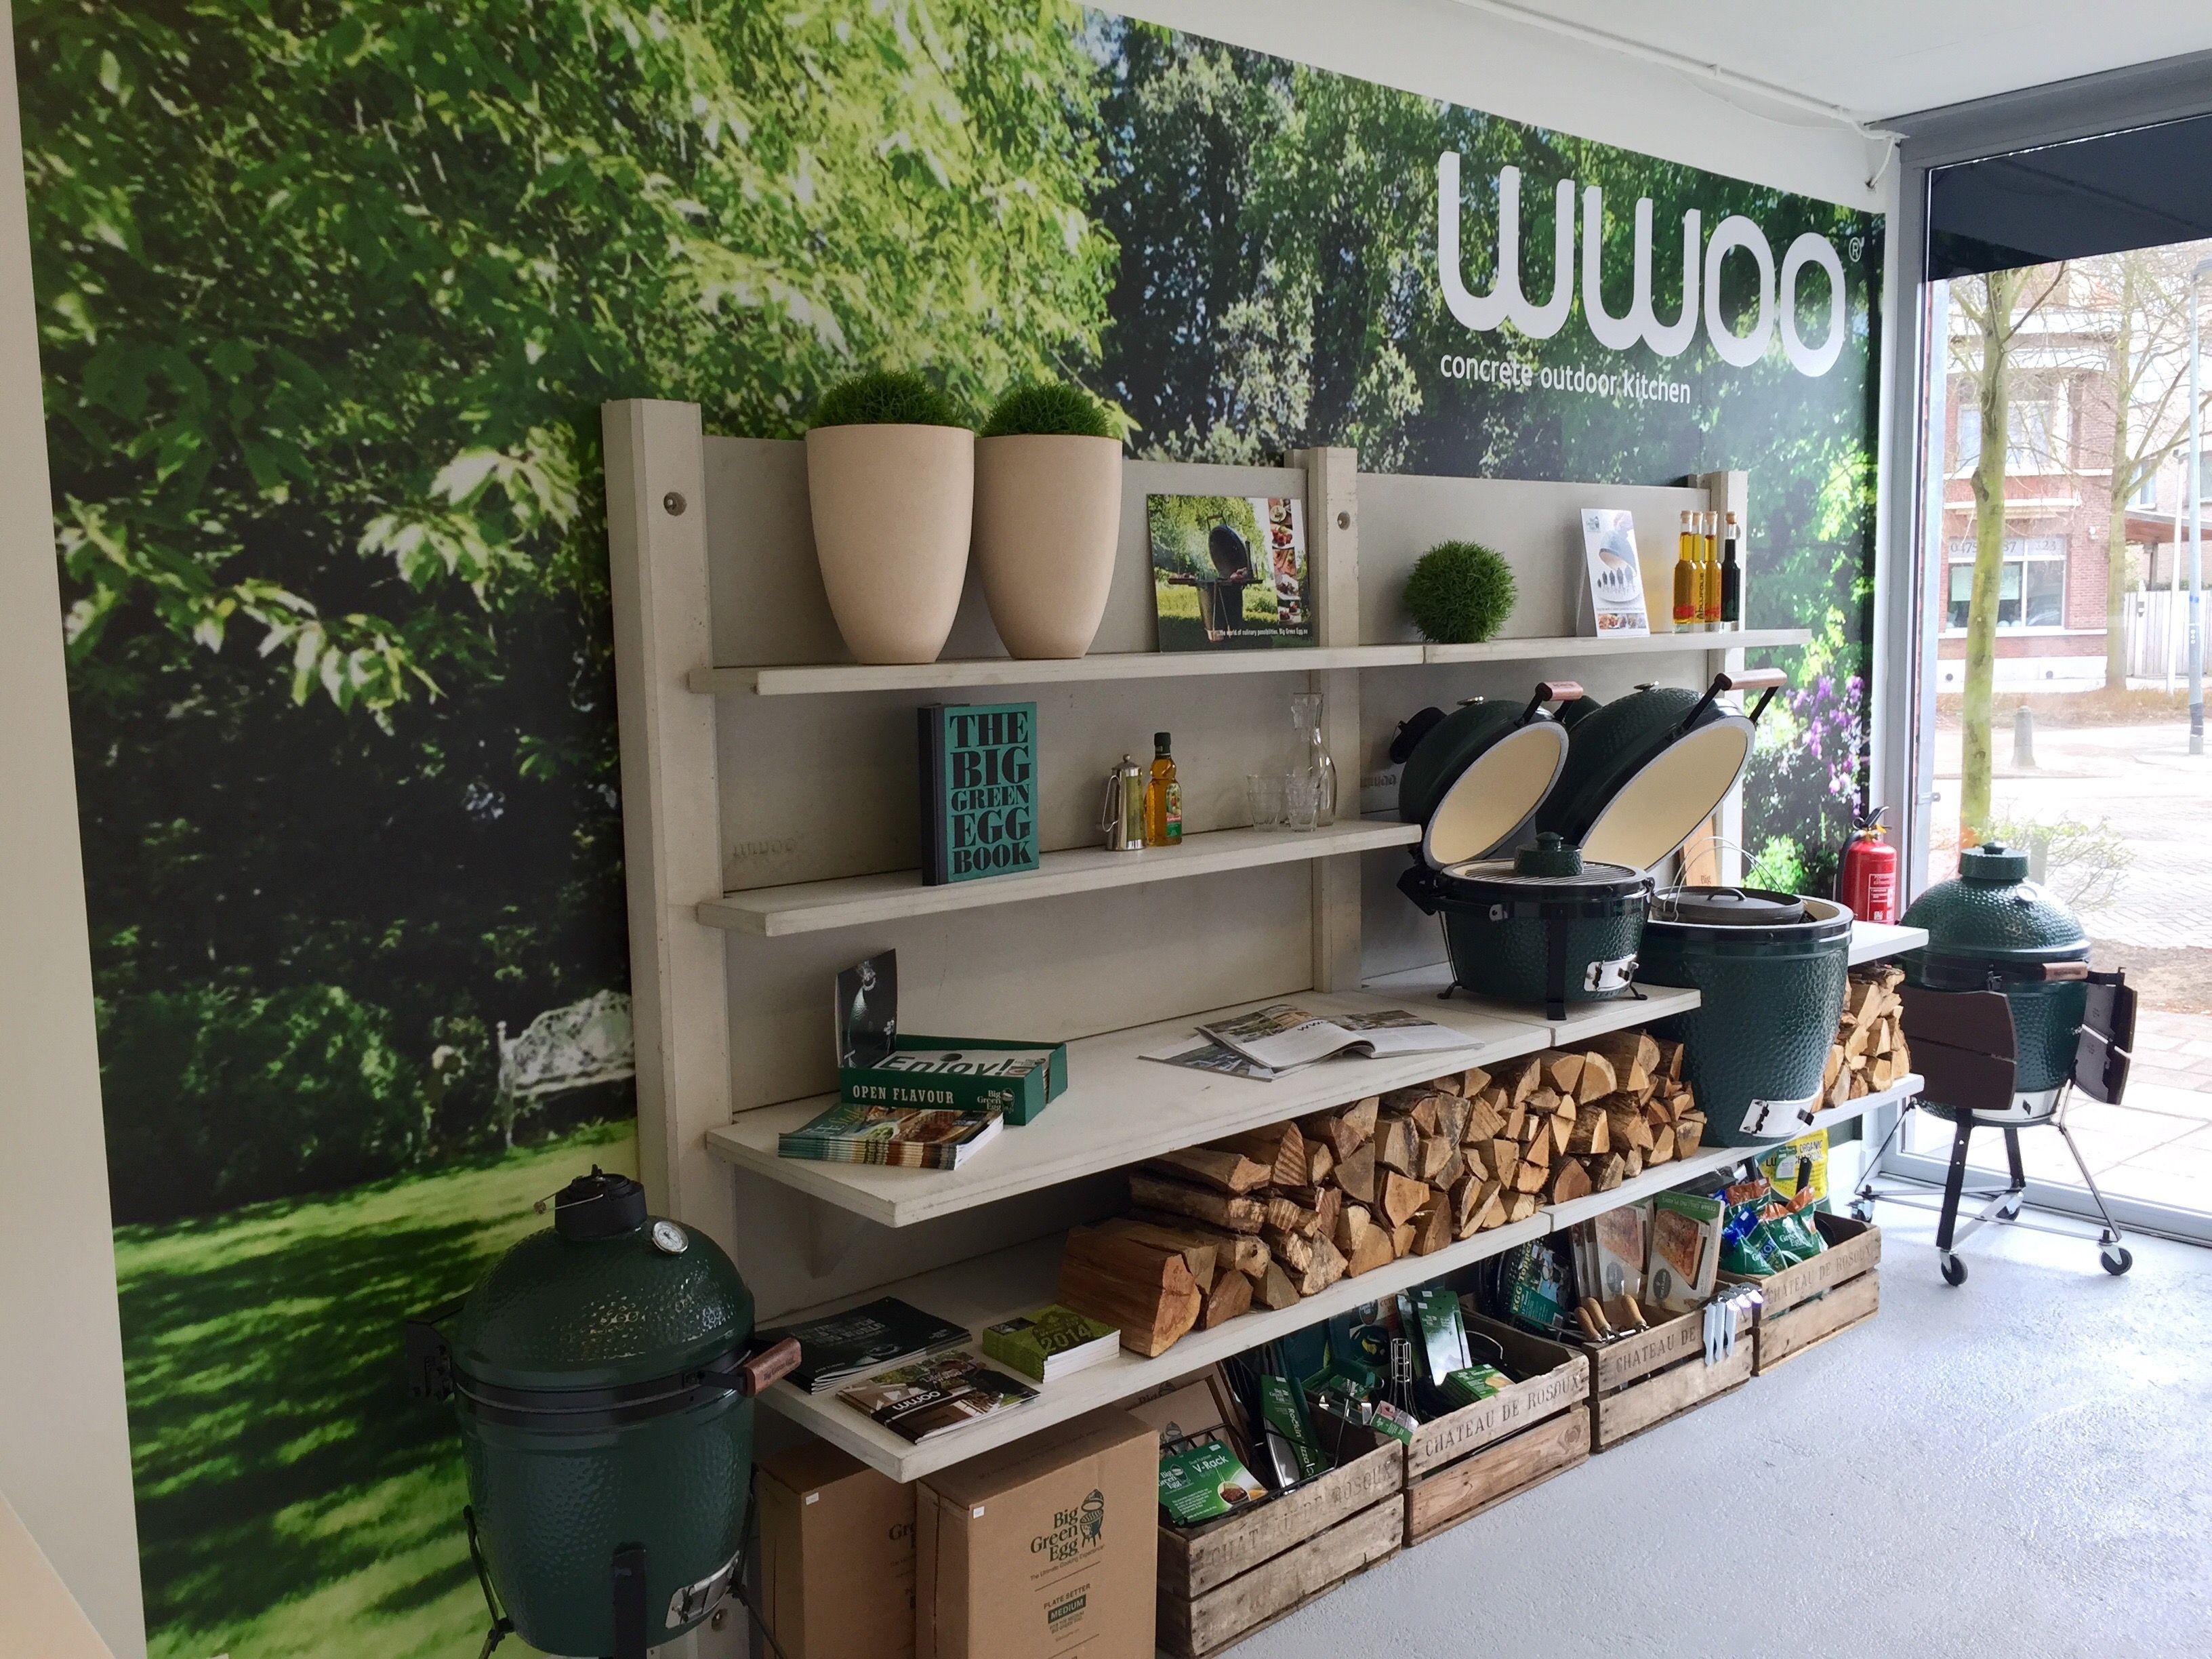 Wwoo concrete outdoor kitchen retail and restaurant designs for